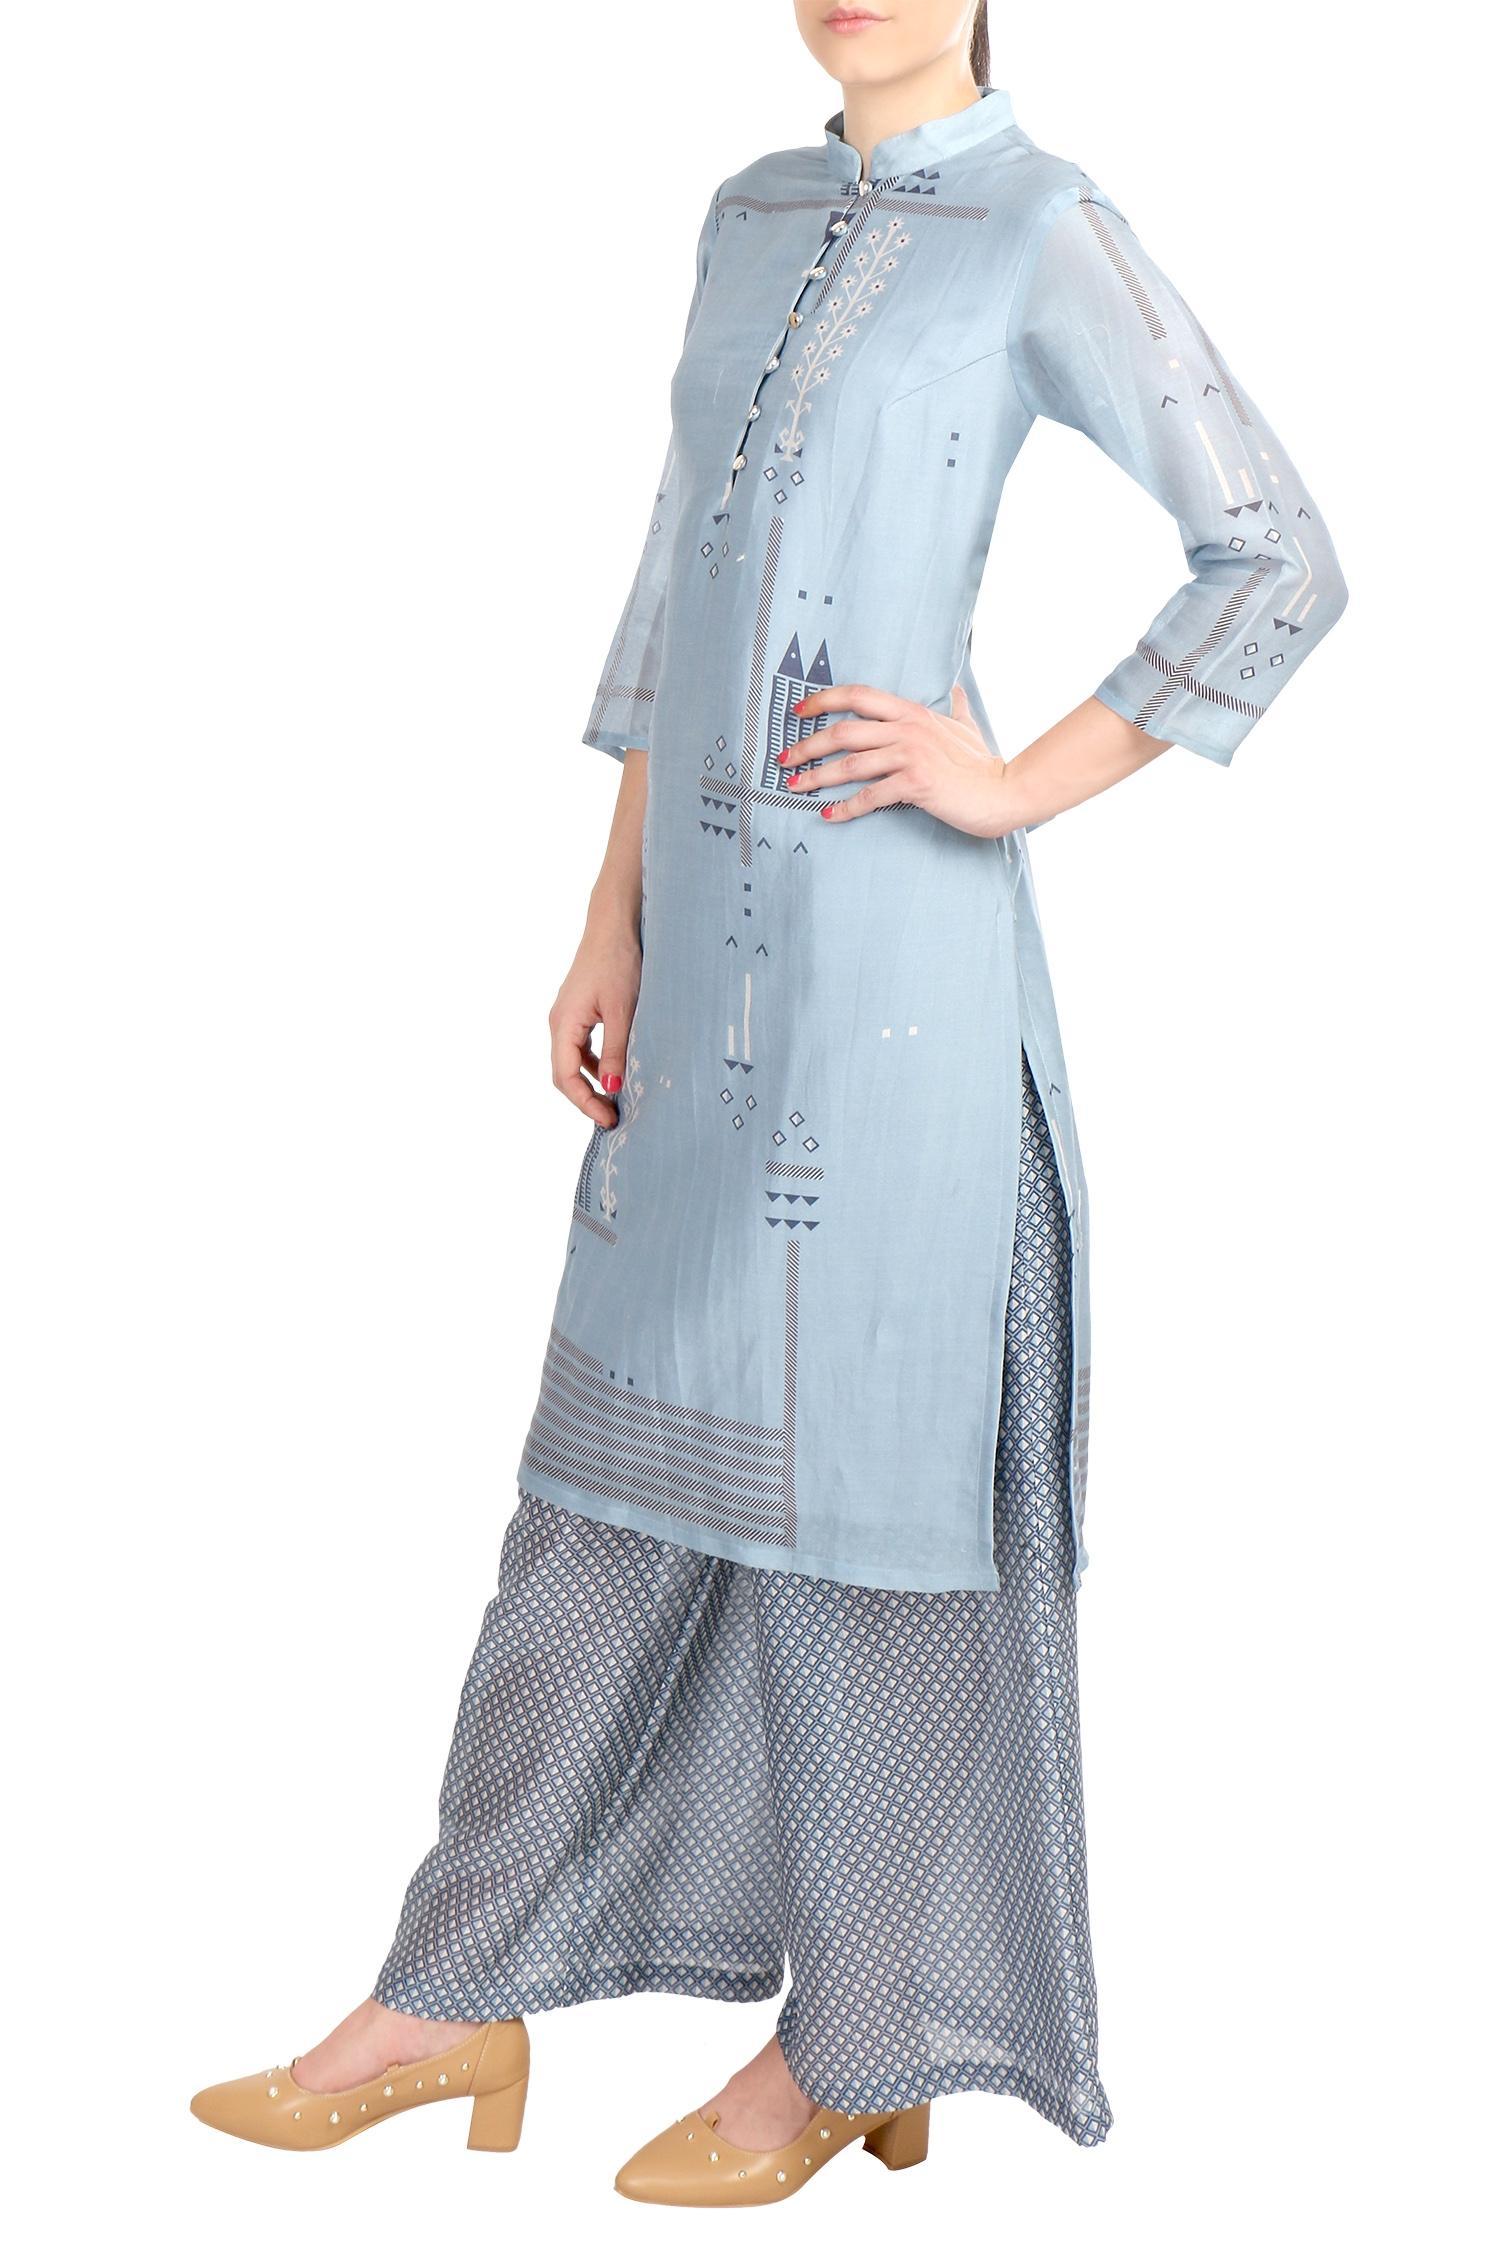 Aza fashions pvt ltd 93